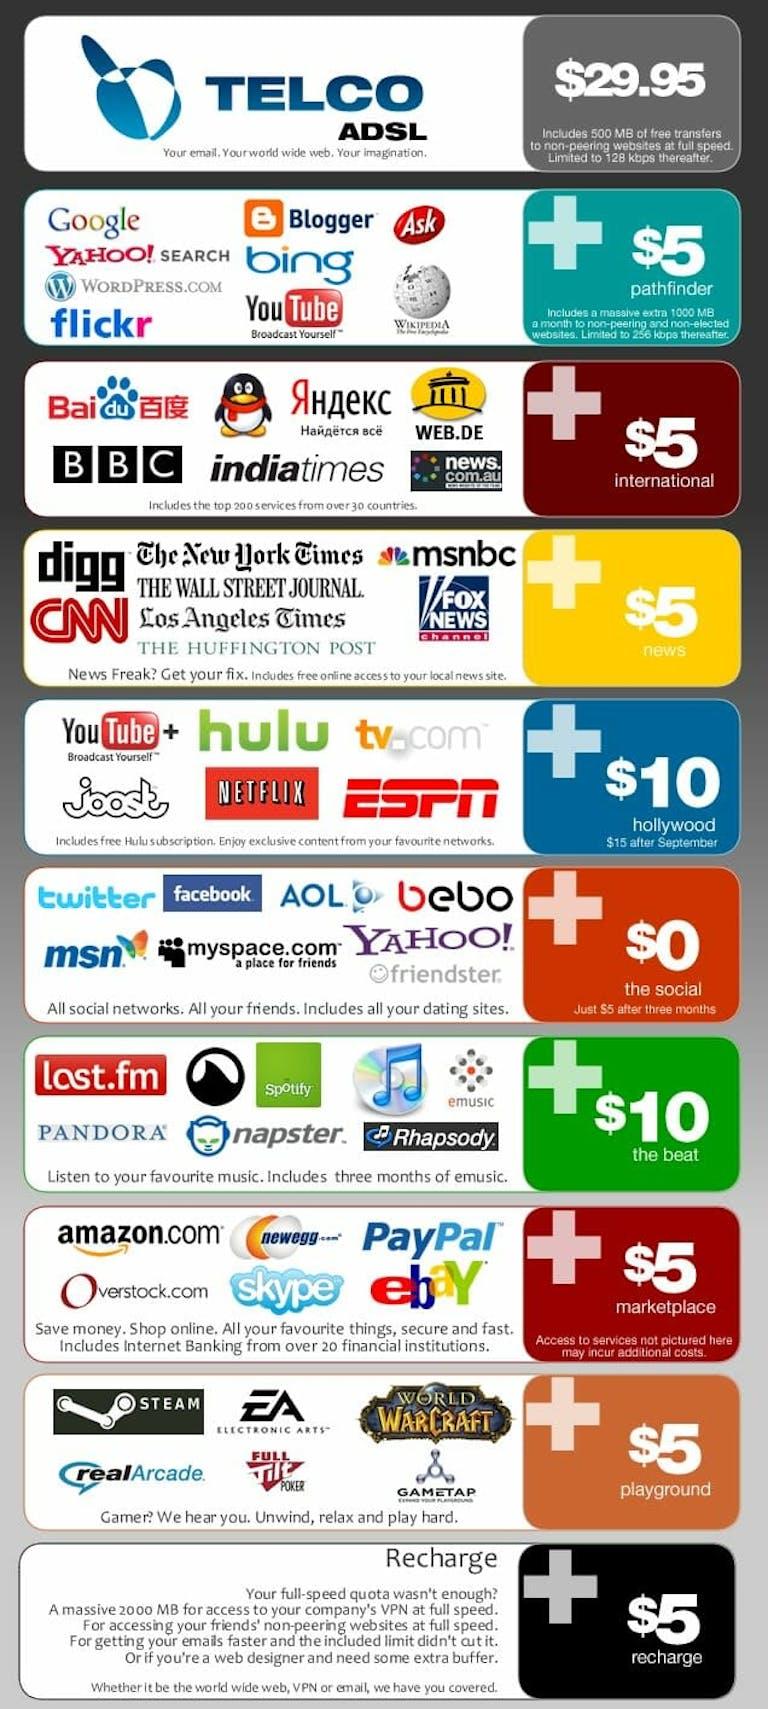 net neutrality without title ii